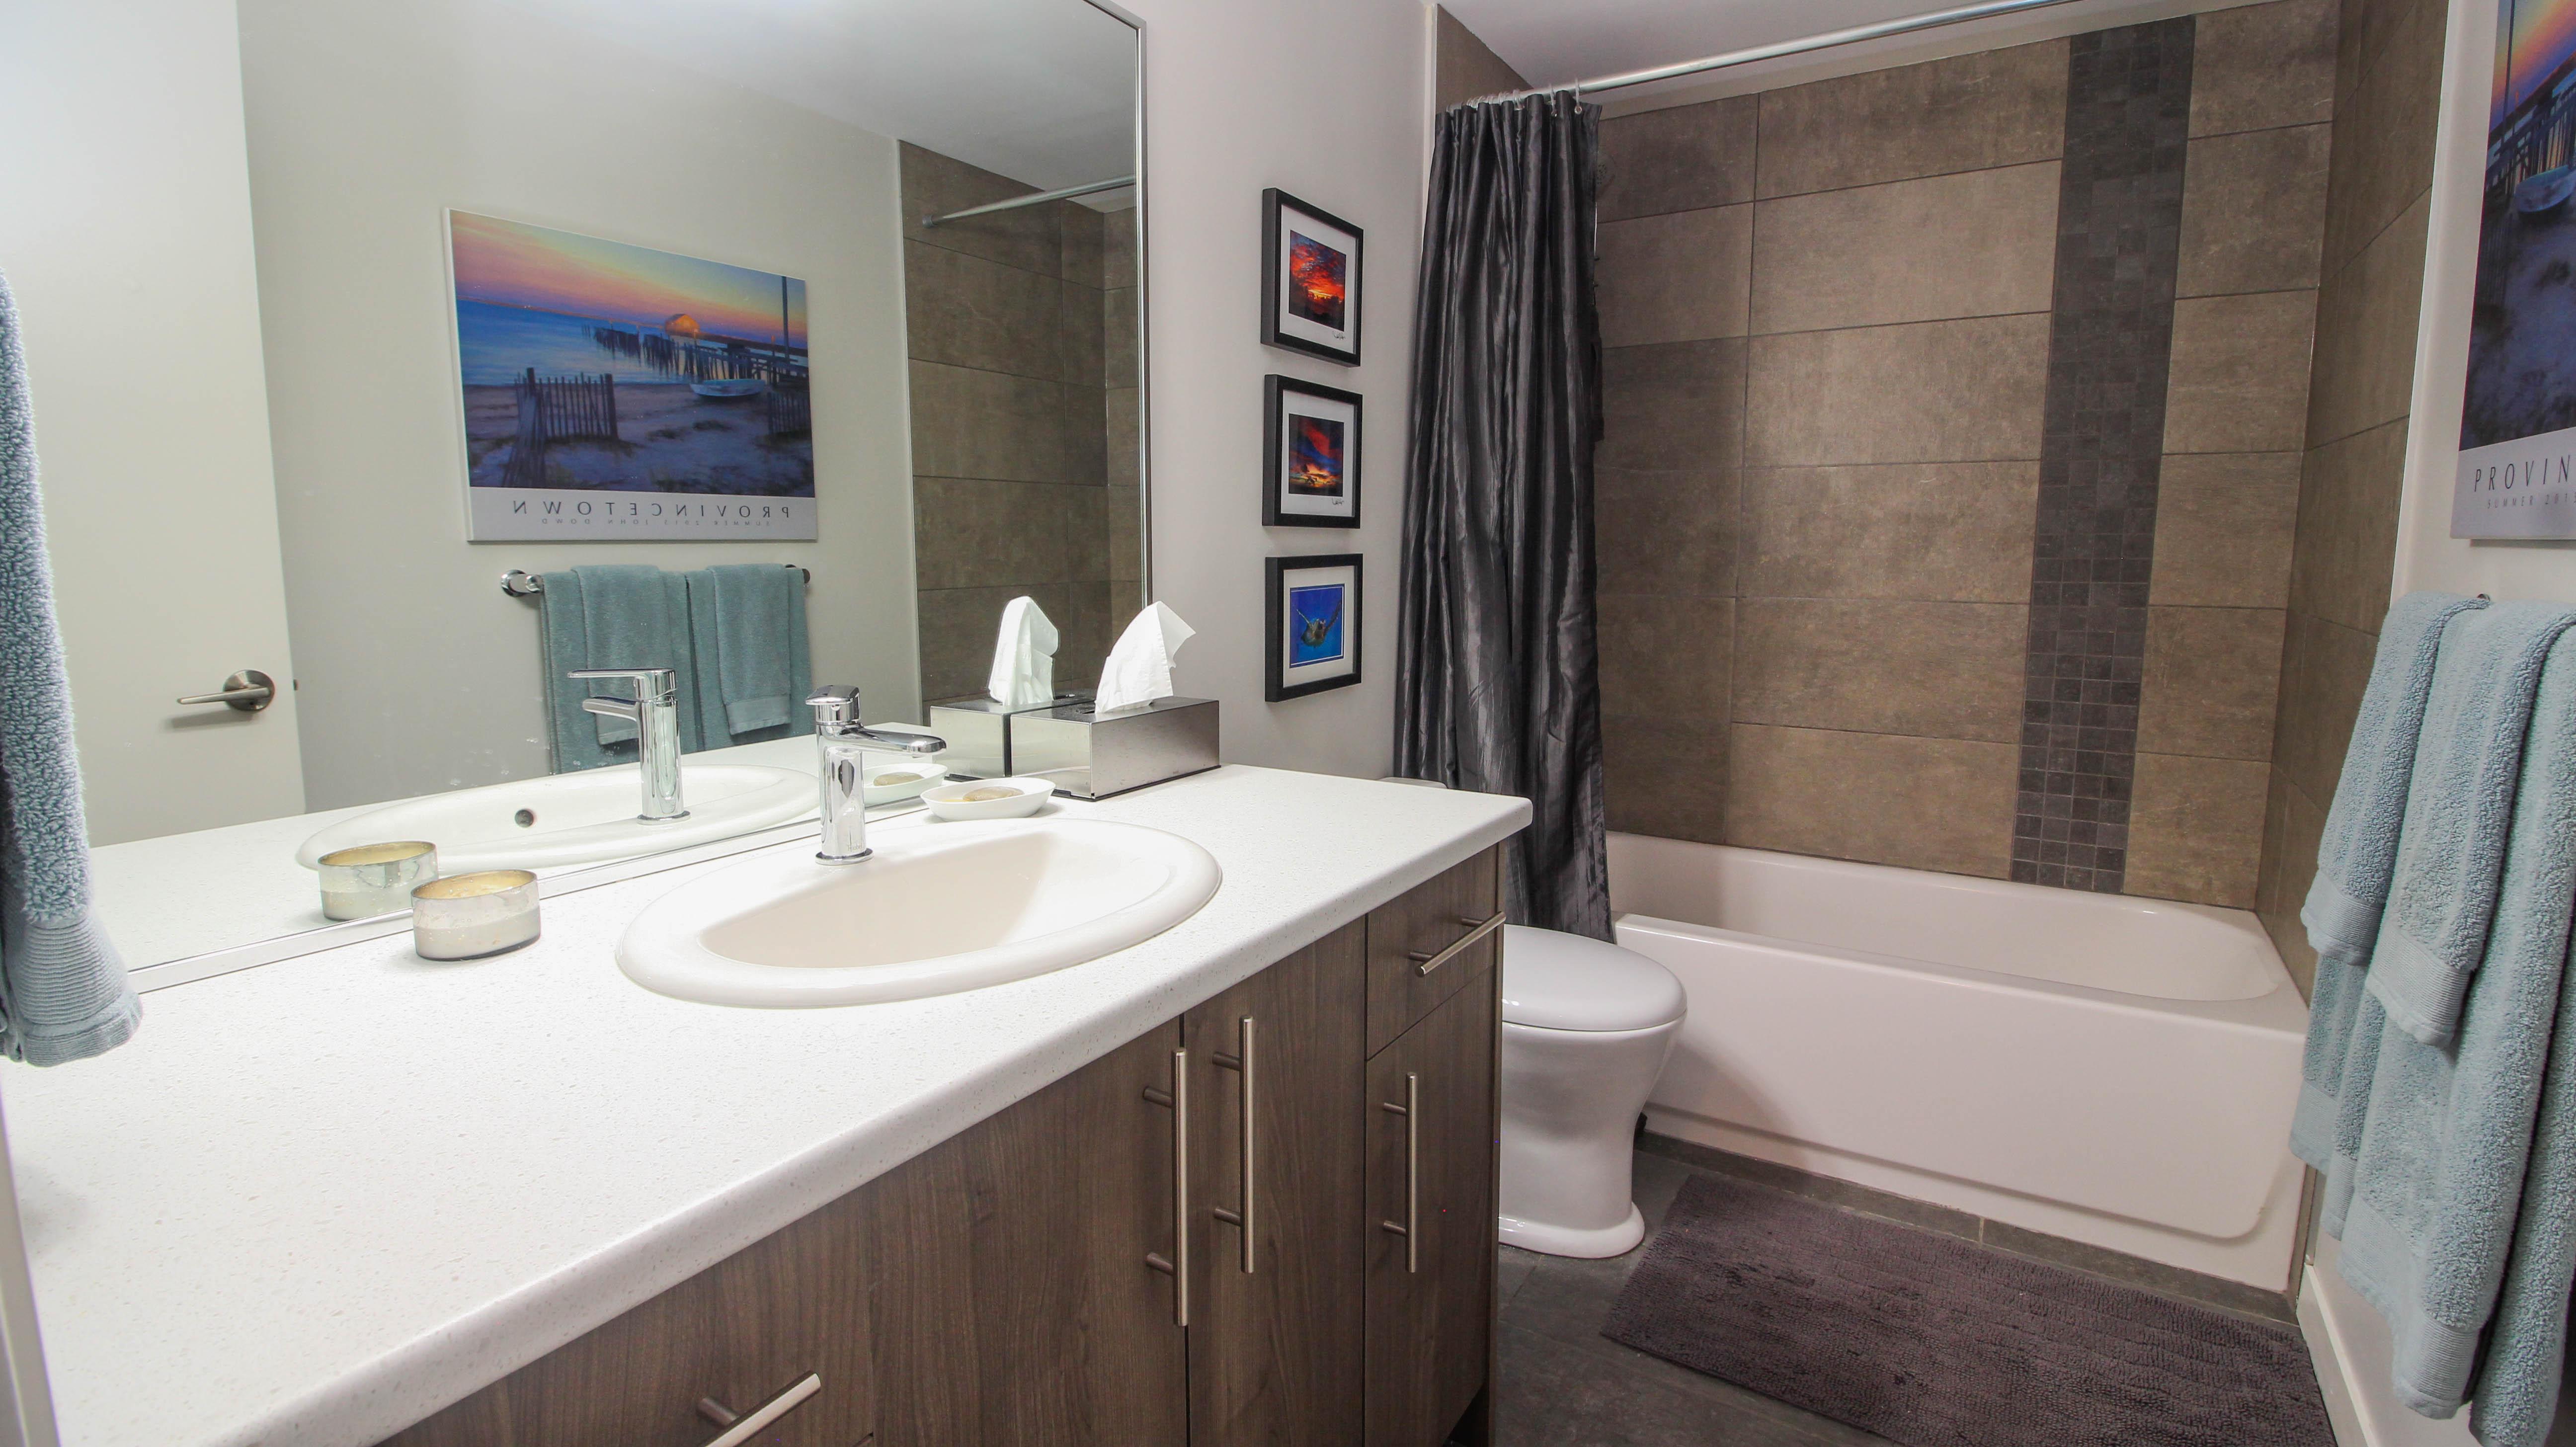 Southgate Apartments bathroom